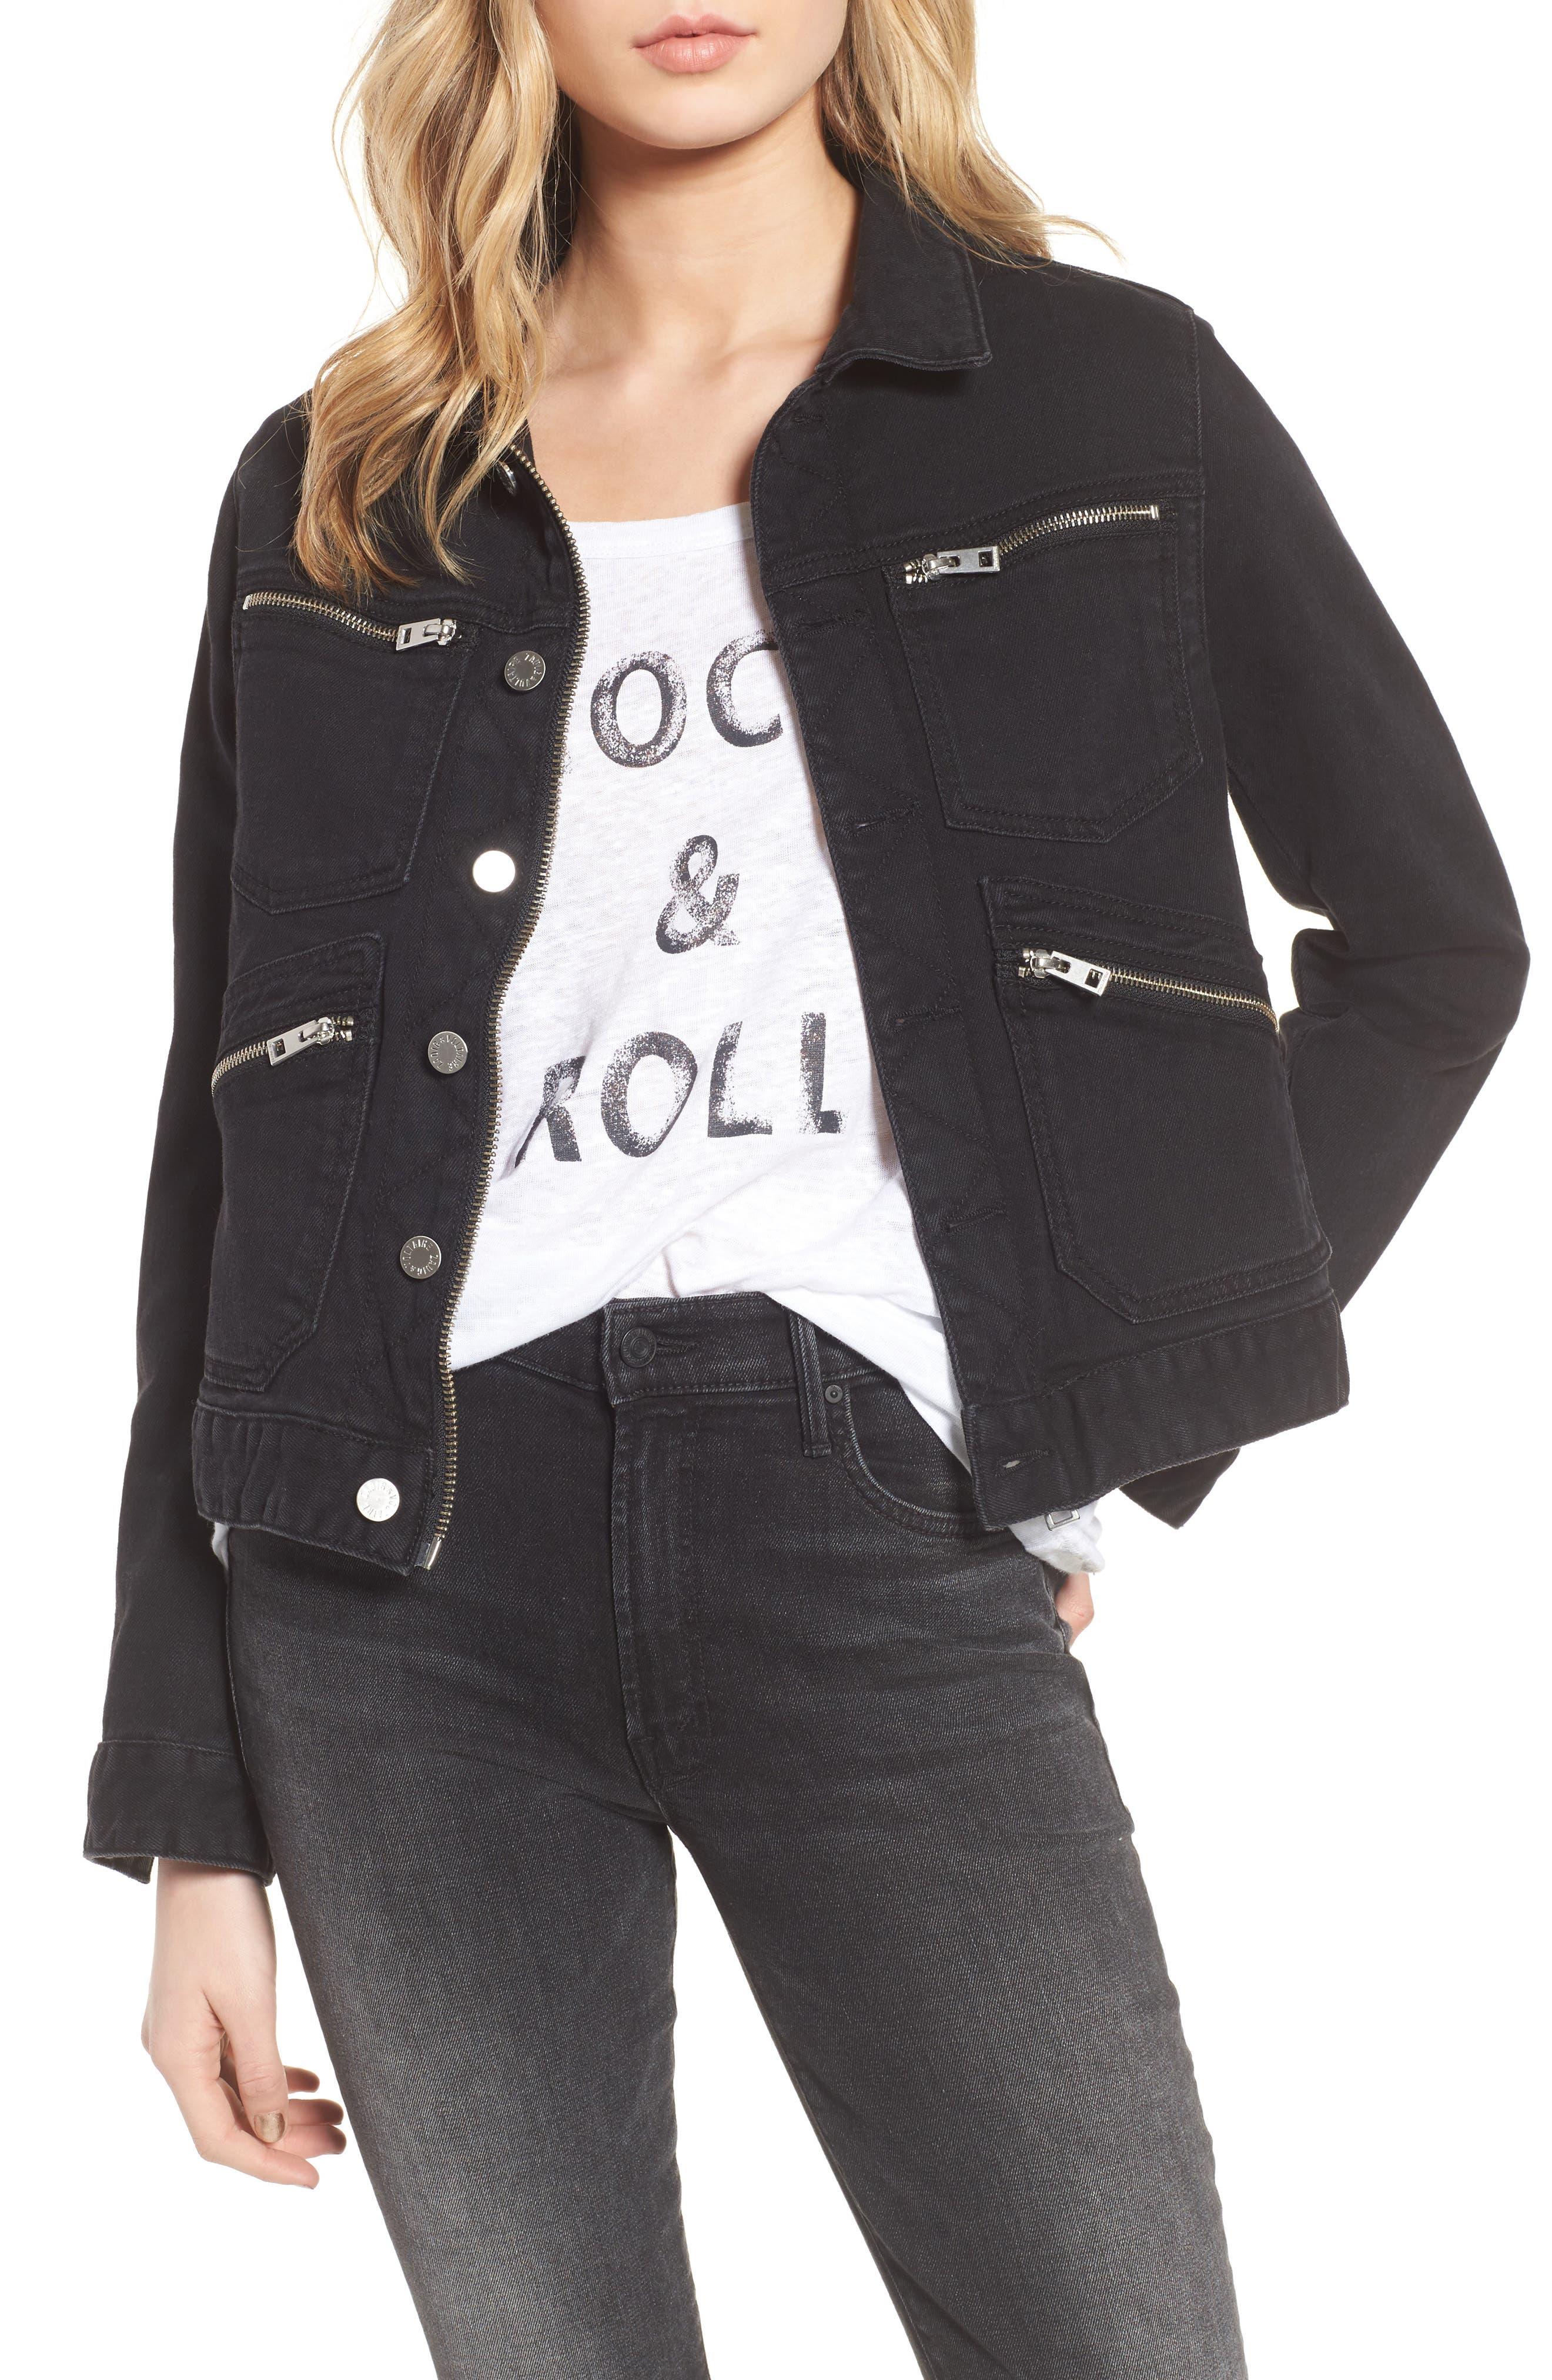 Kioko Cat Jacket,                             Main thumbnail 1, color,                             Black